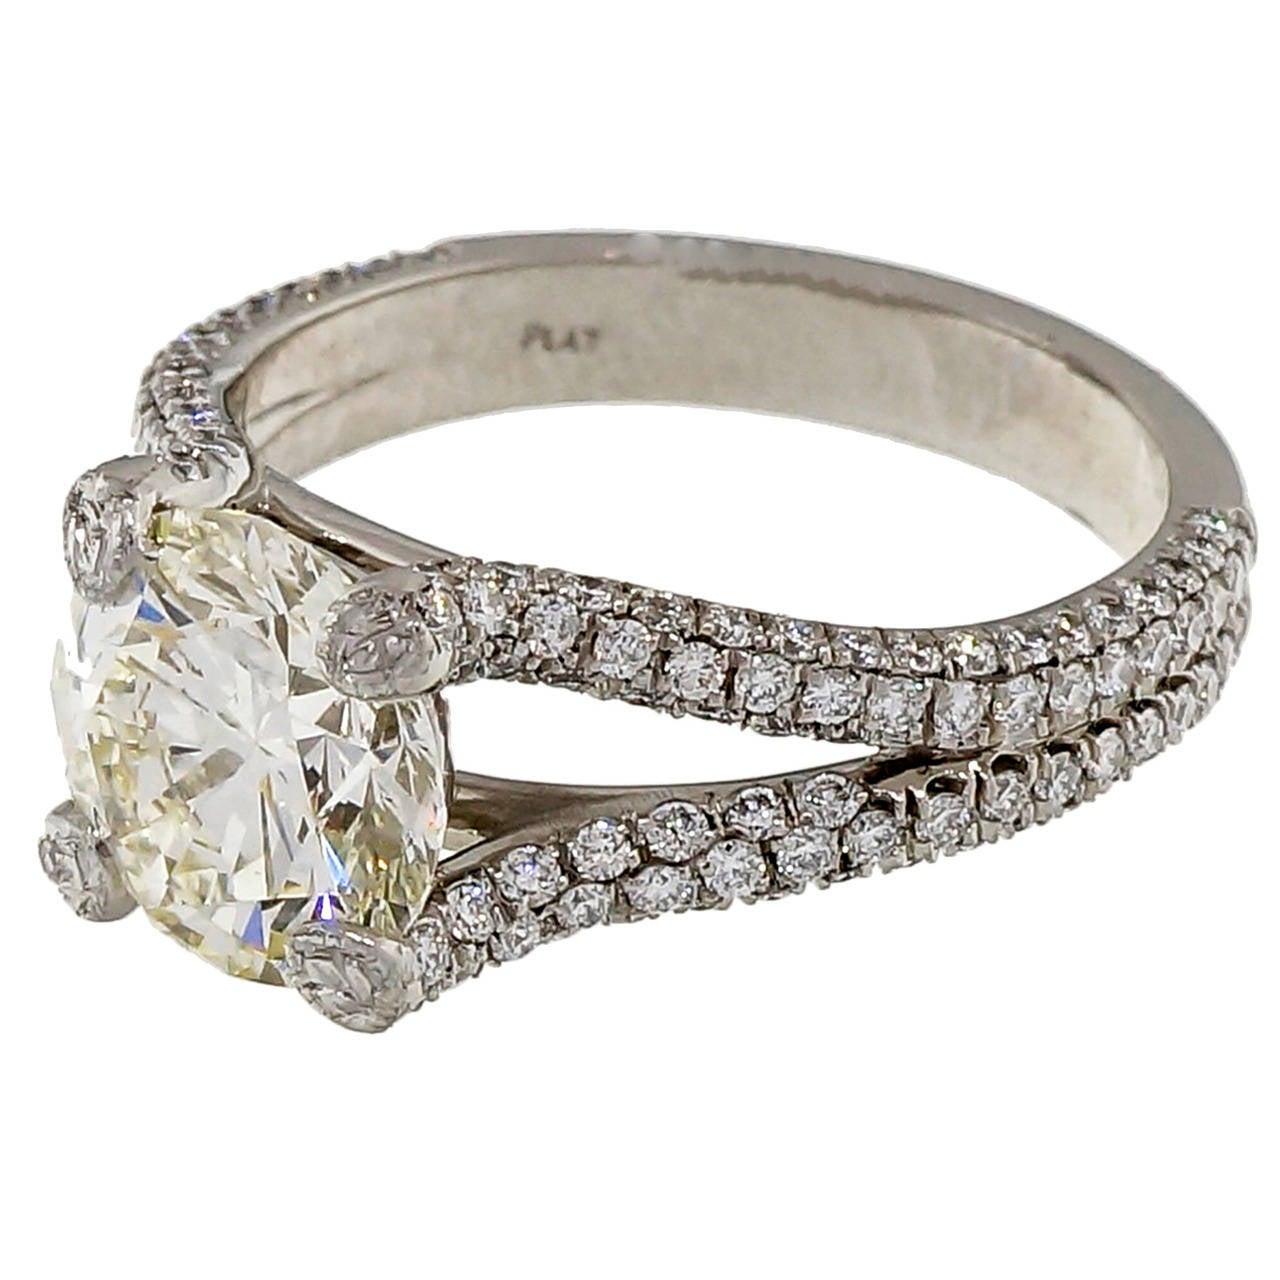 Diamond Rings For Sale Cheap: Peter Suchy Diamond Split Shank Platinum Engagement Ring